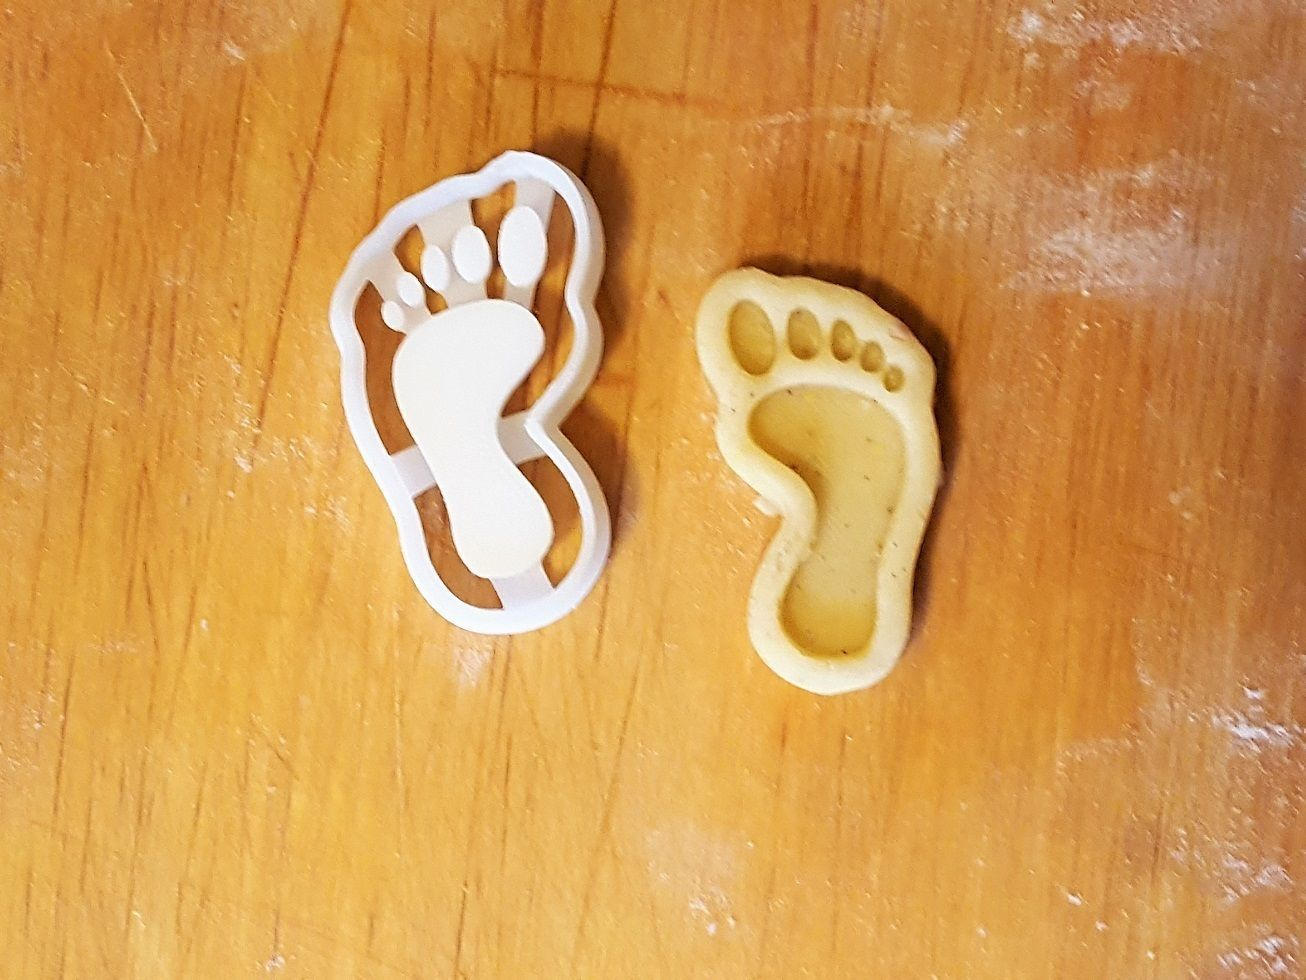 Foot cookie cutter